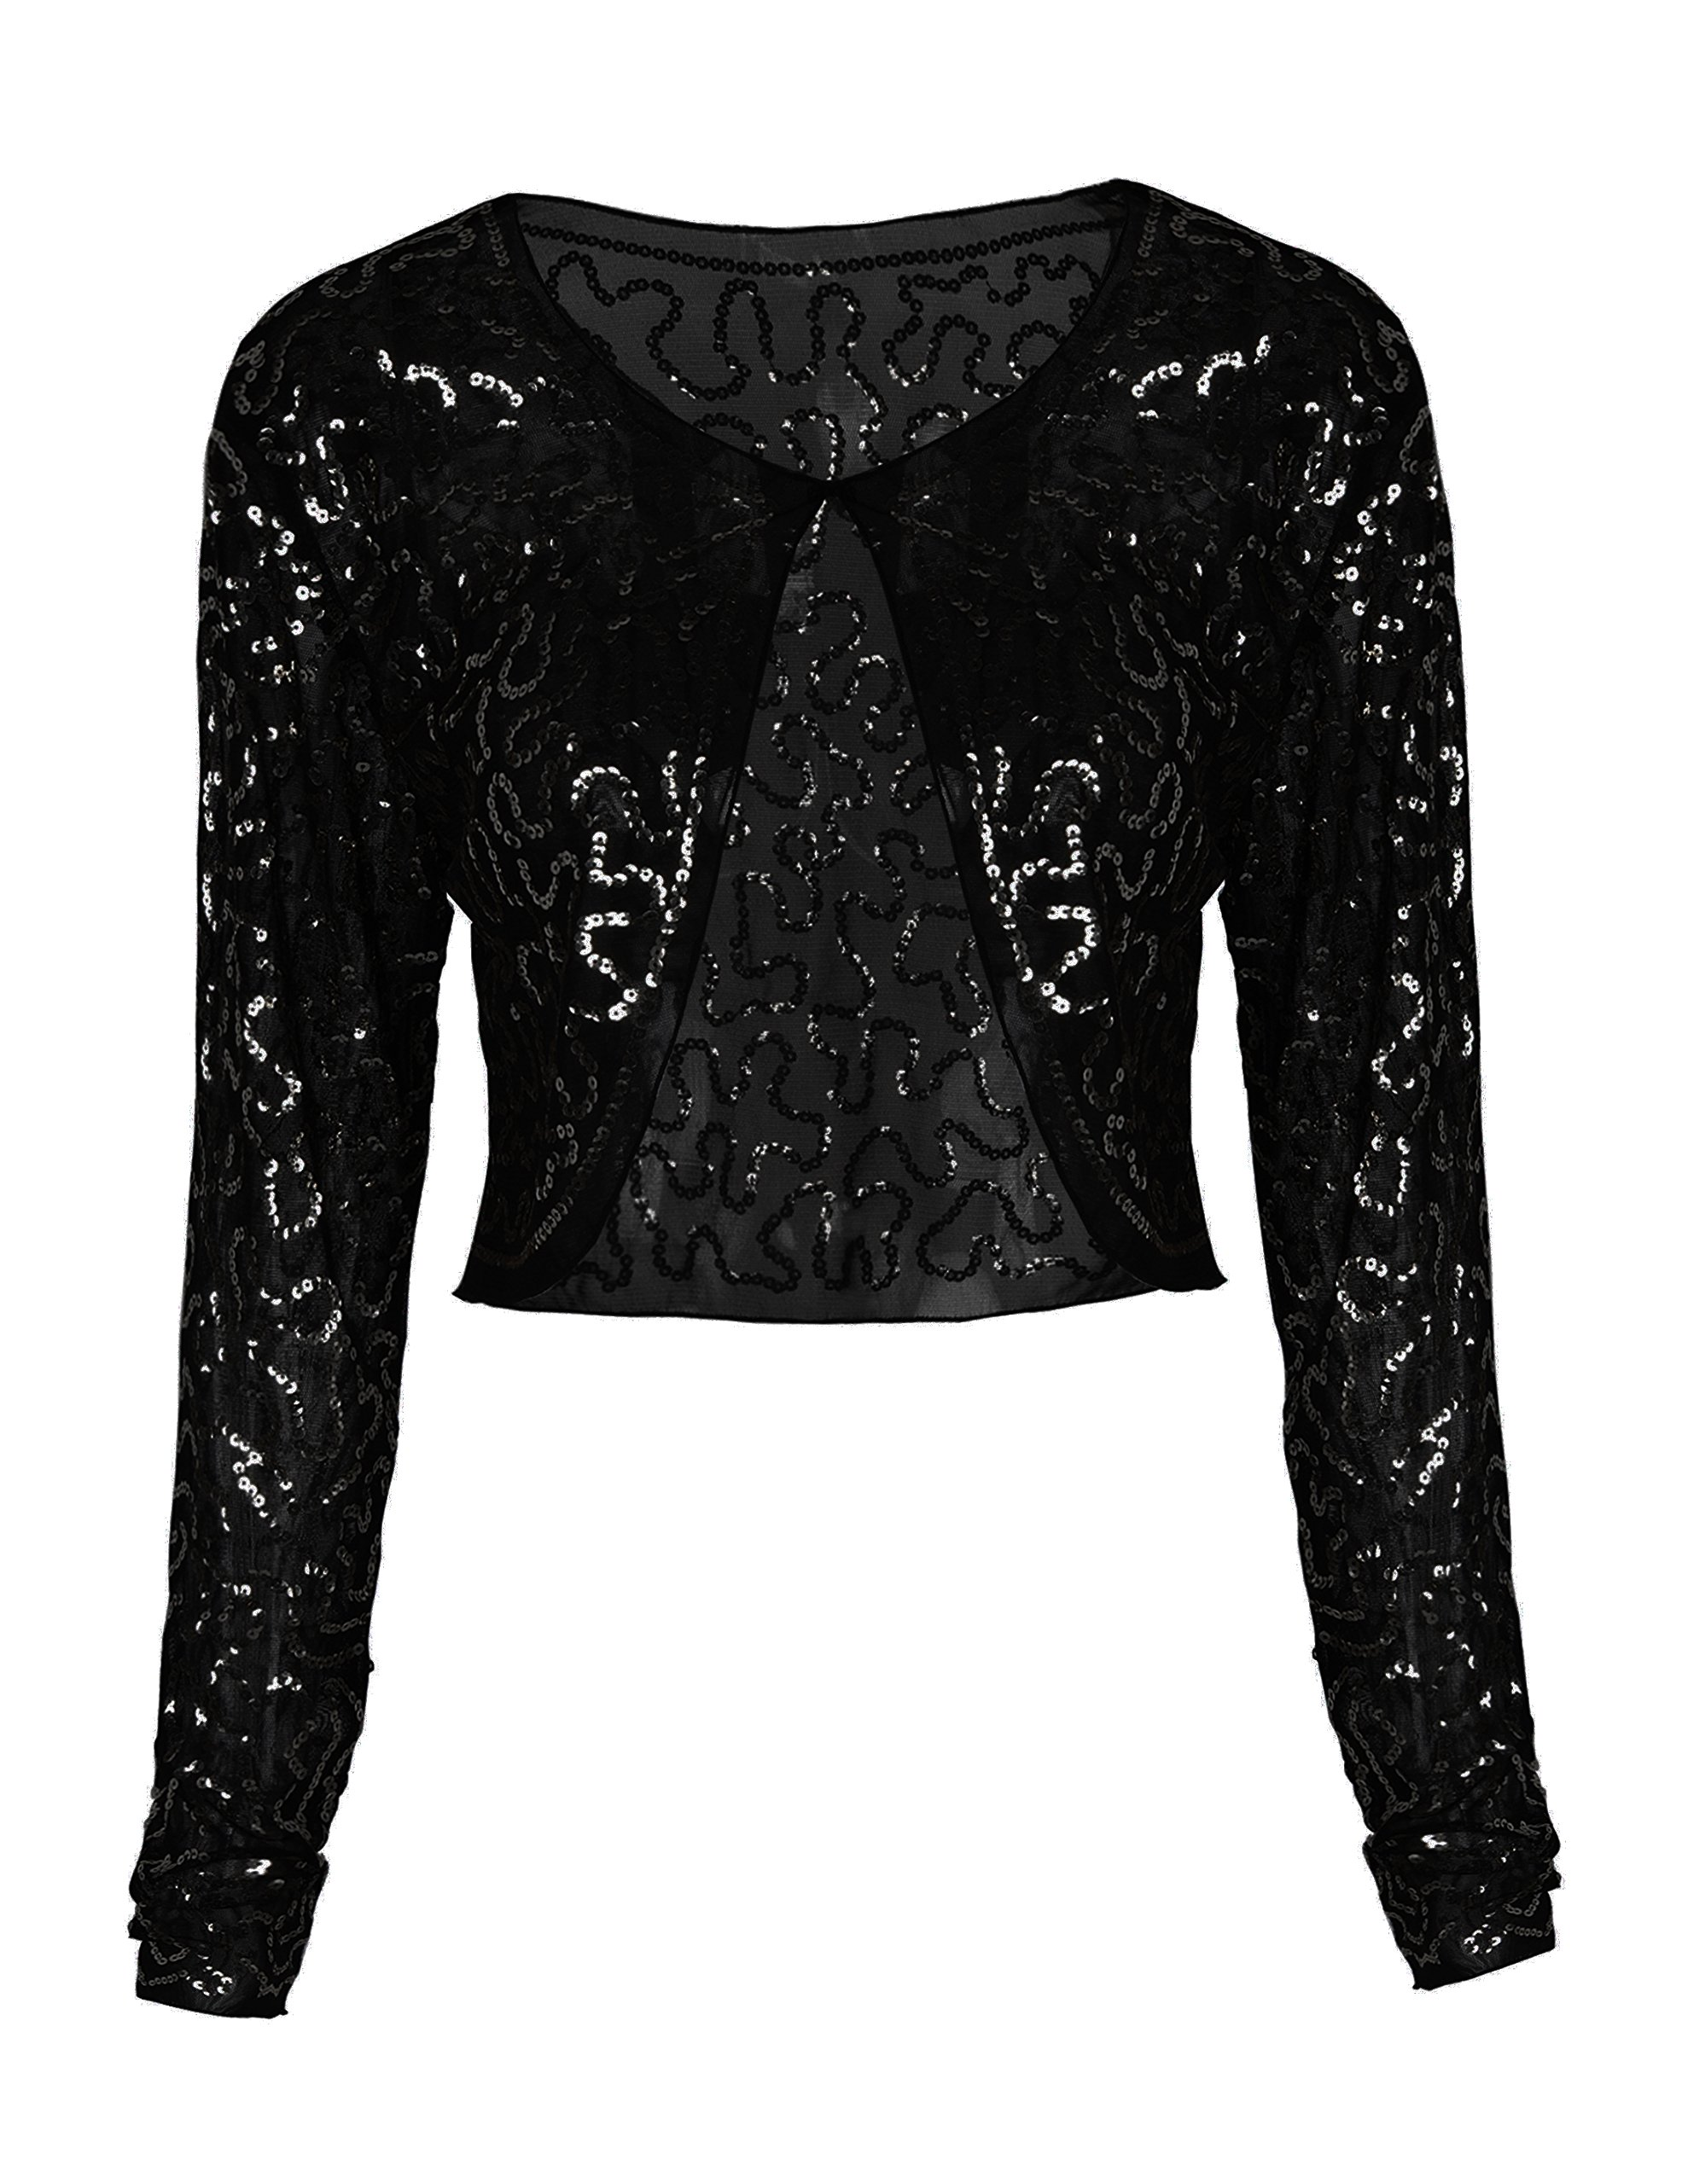 PrettyGuide Women Sequin Bolero Long Sleeve Sparkly Mesh Shrug Sequin Tops Black XL/US14-16